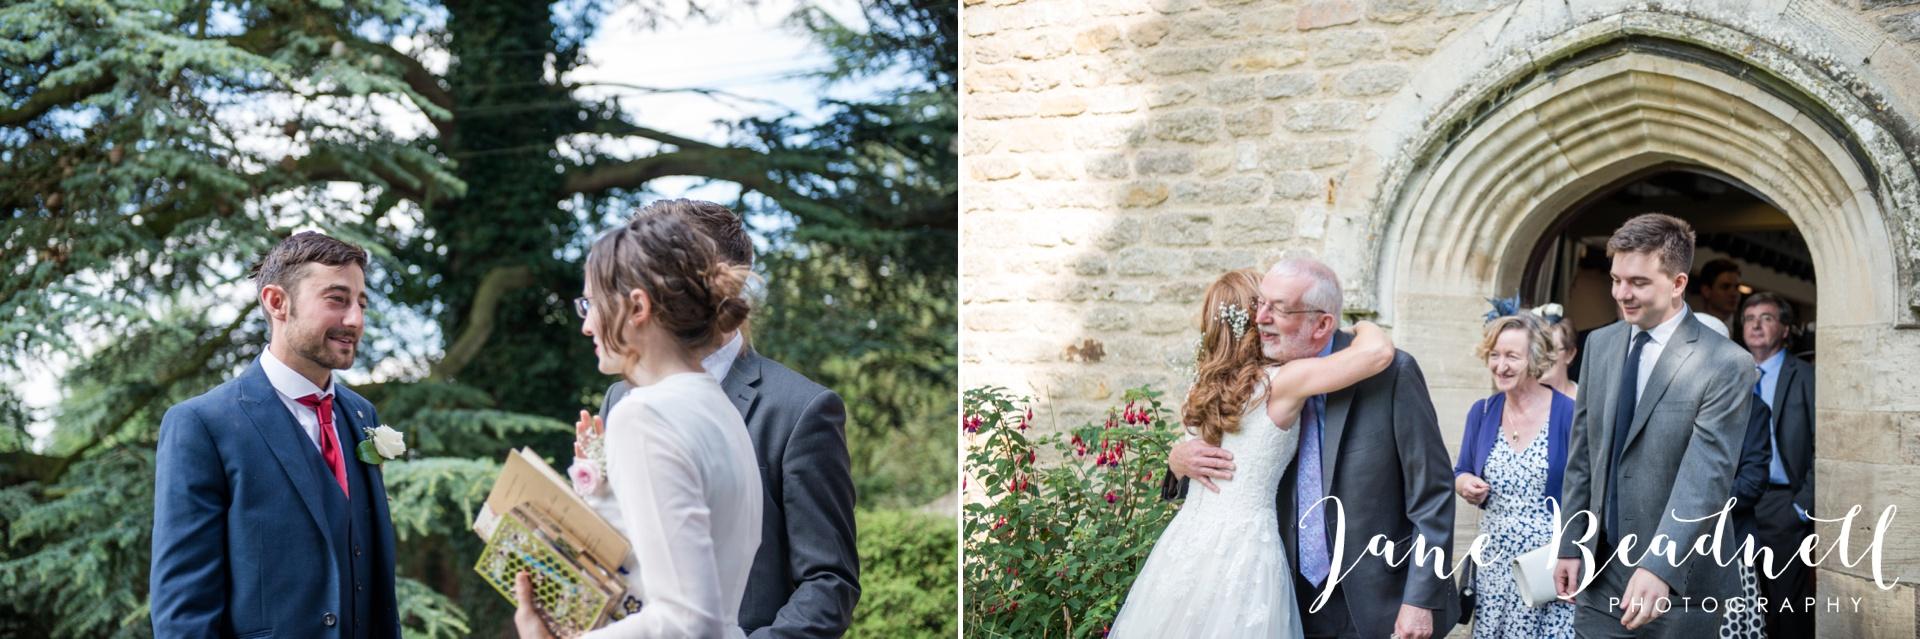 yorkshire-fine-art-wedding-photographer-jane-beadnell-photography-poppleton-york_0062